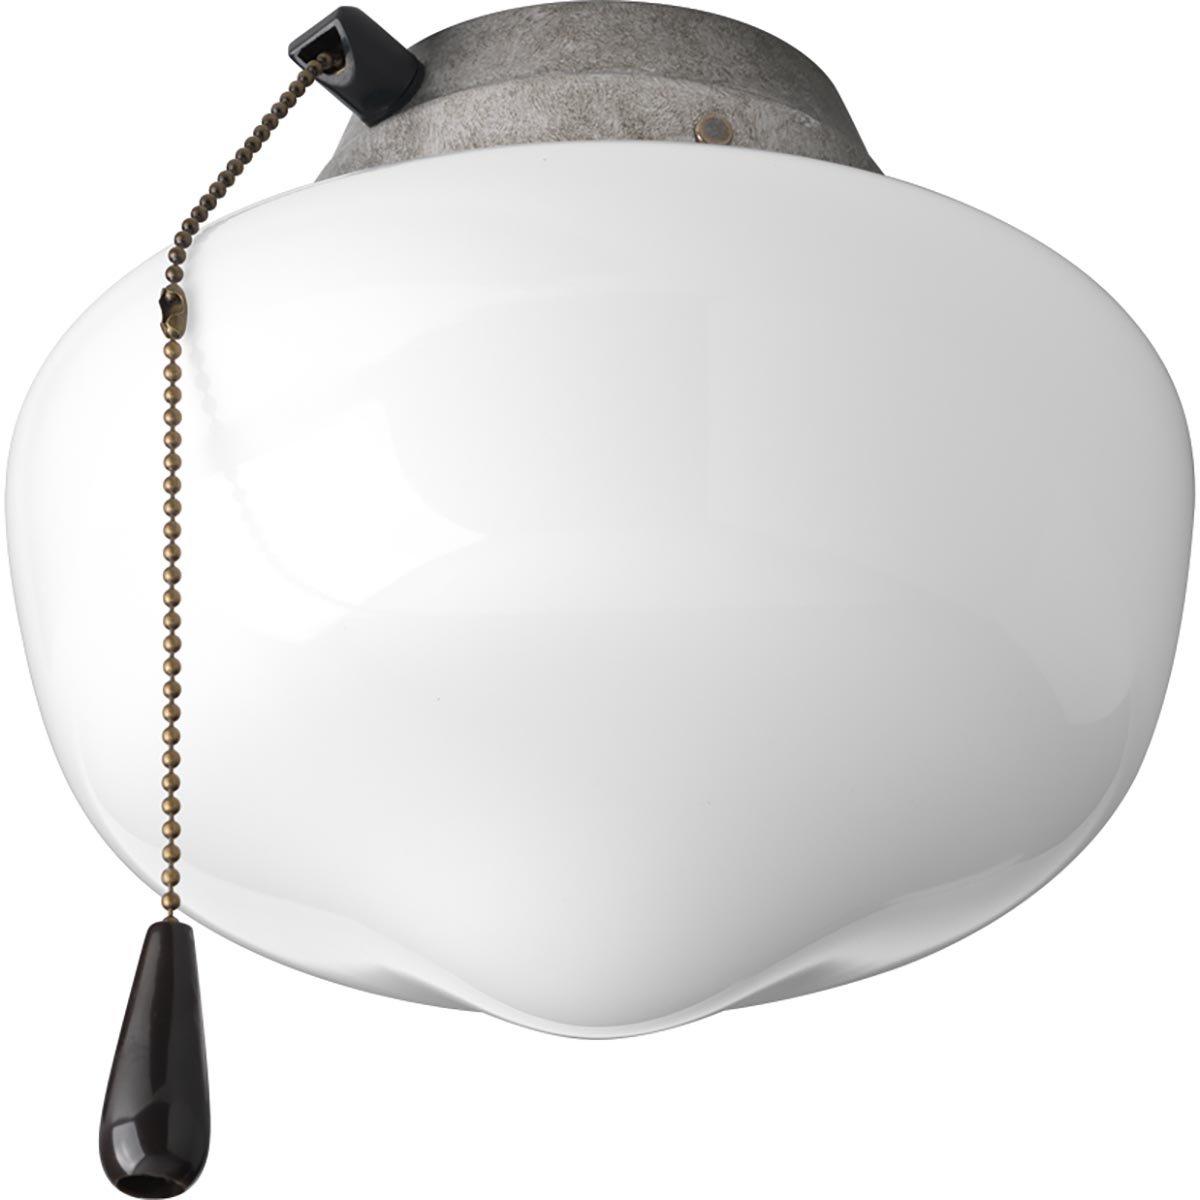 Progress Lighting P2601-141WB Fan Light Kit, Galvanized Finish